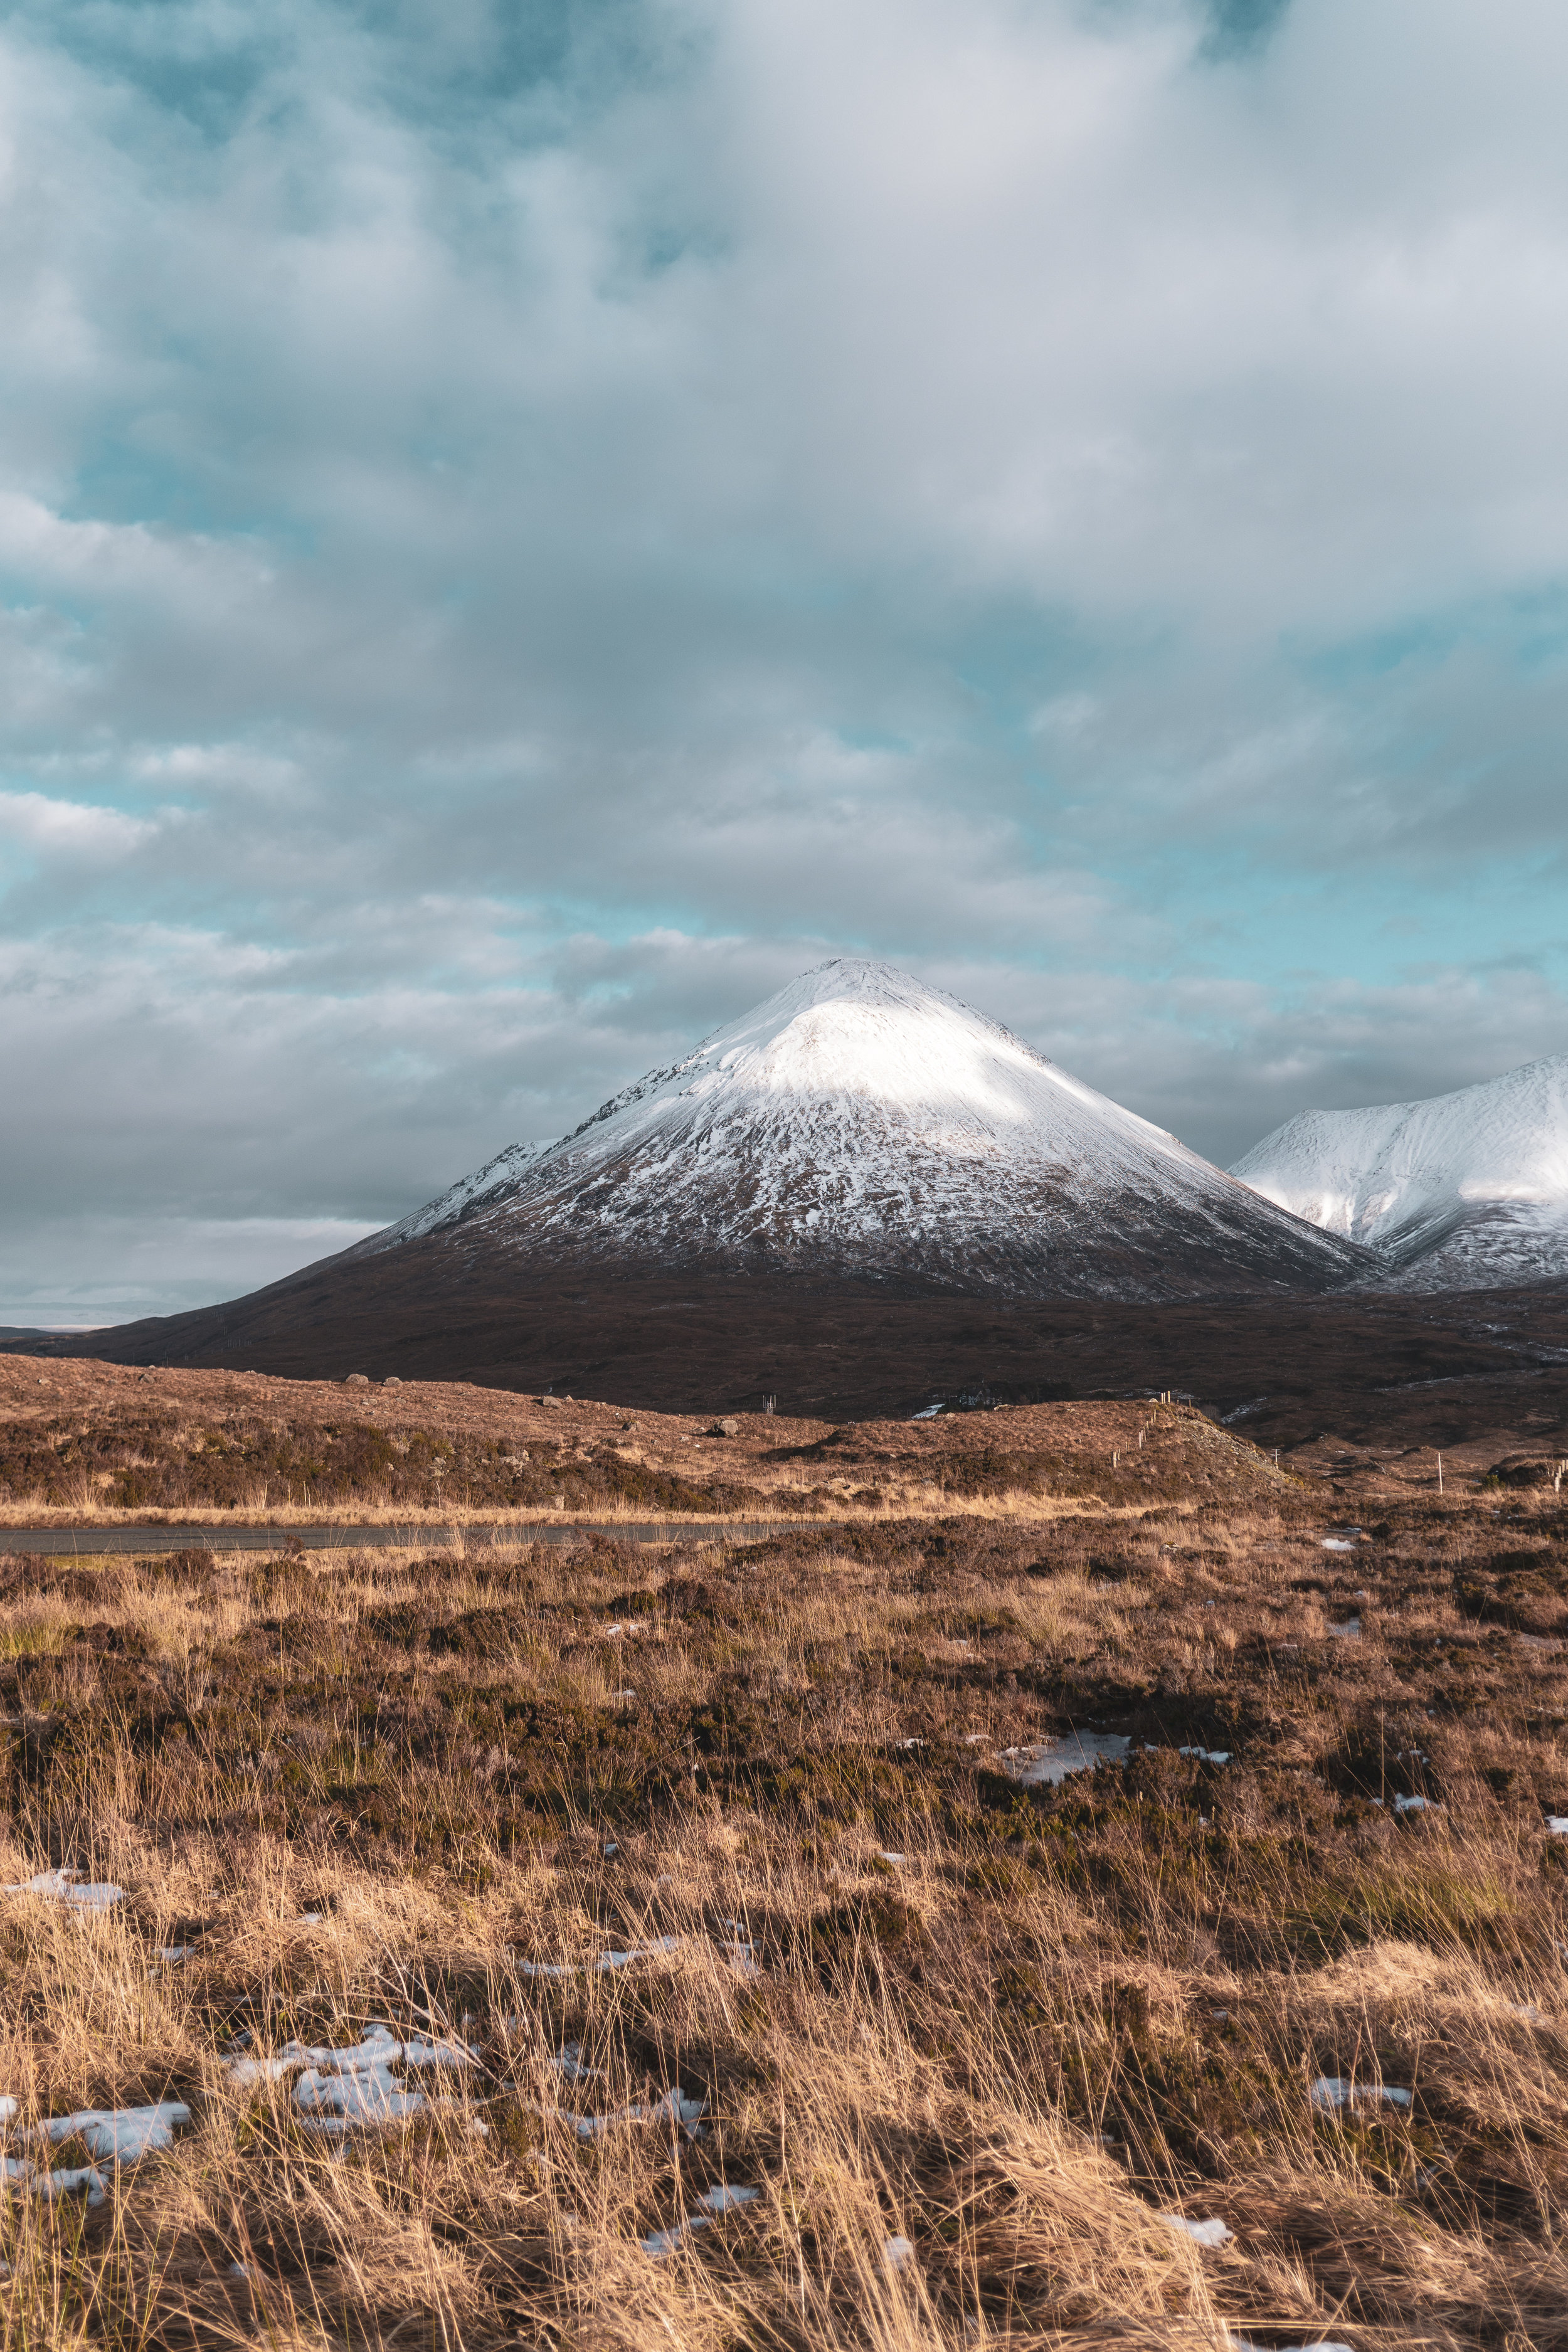 Isle-of-Skye-Fairy-Glen-und-Braes (1).jpg